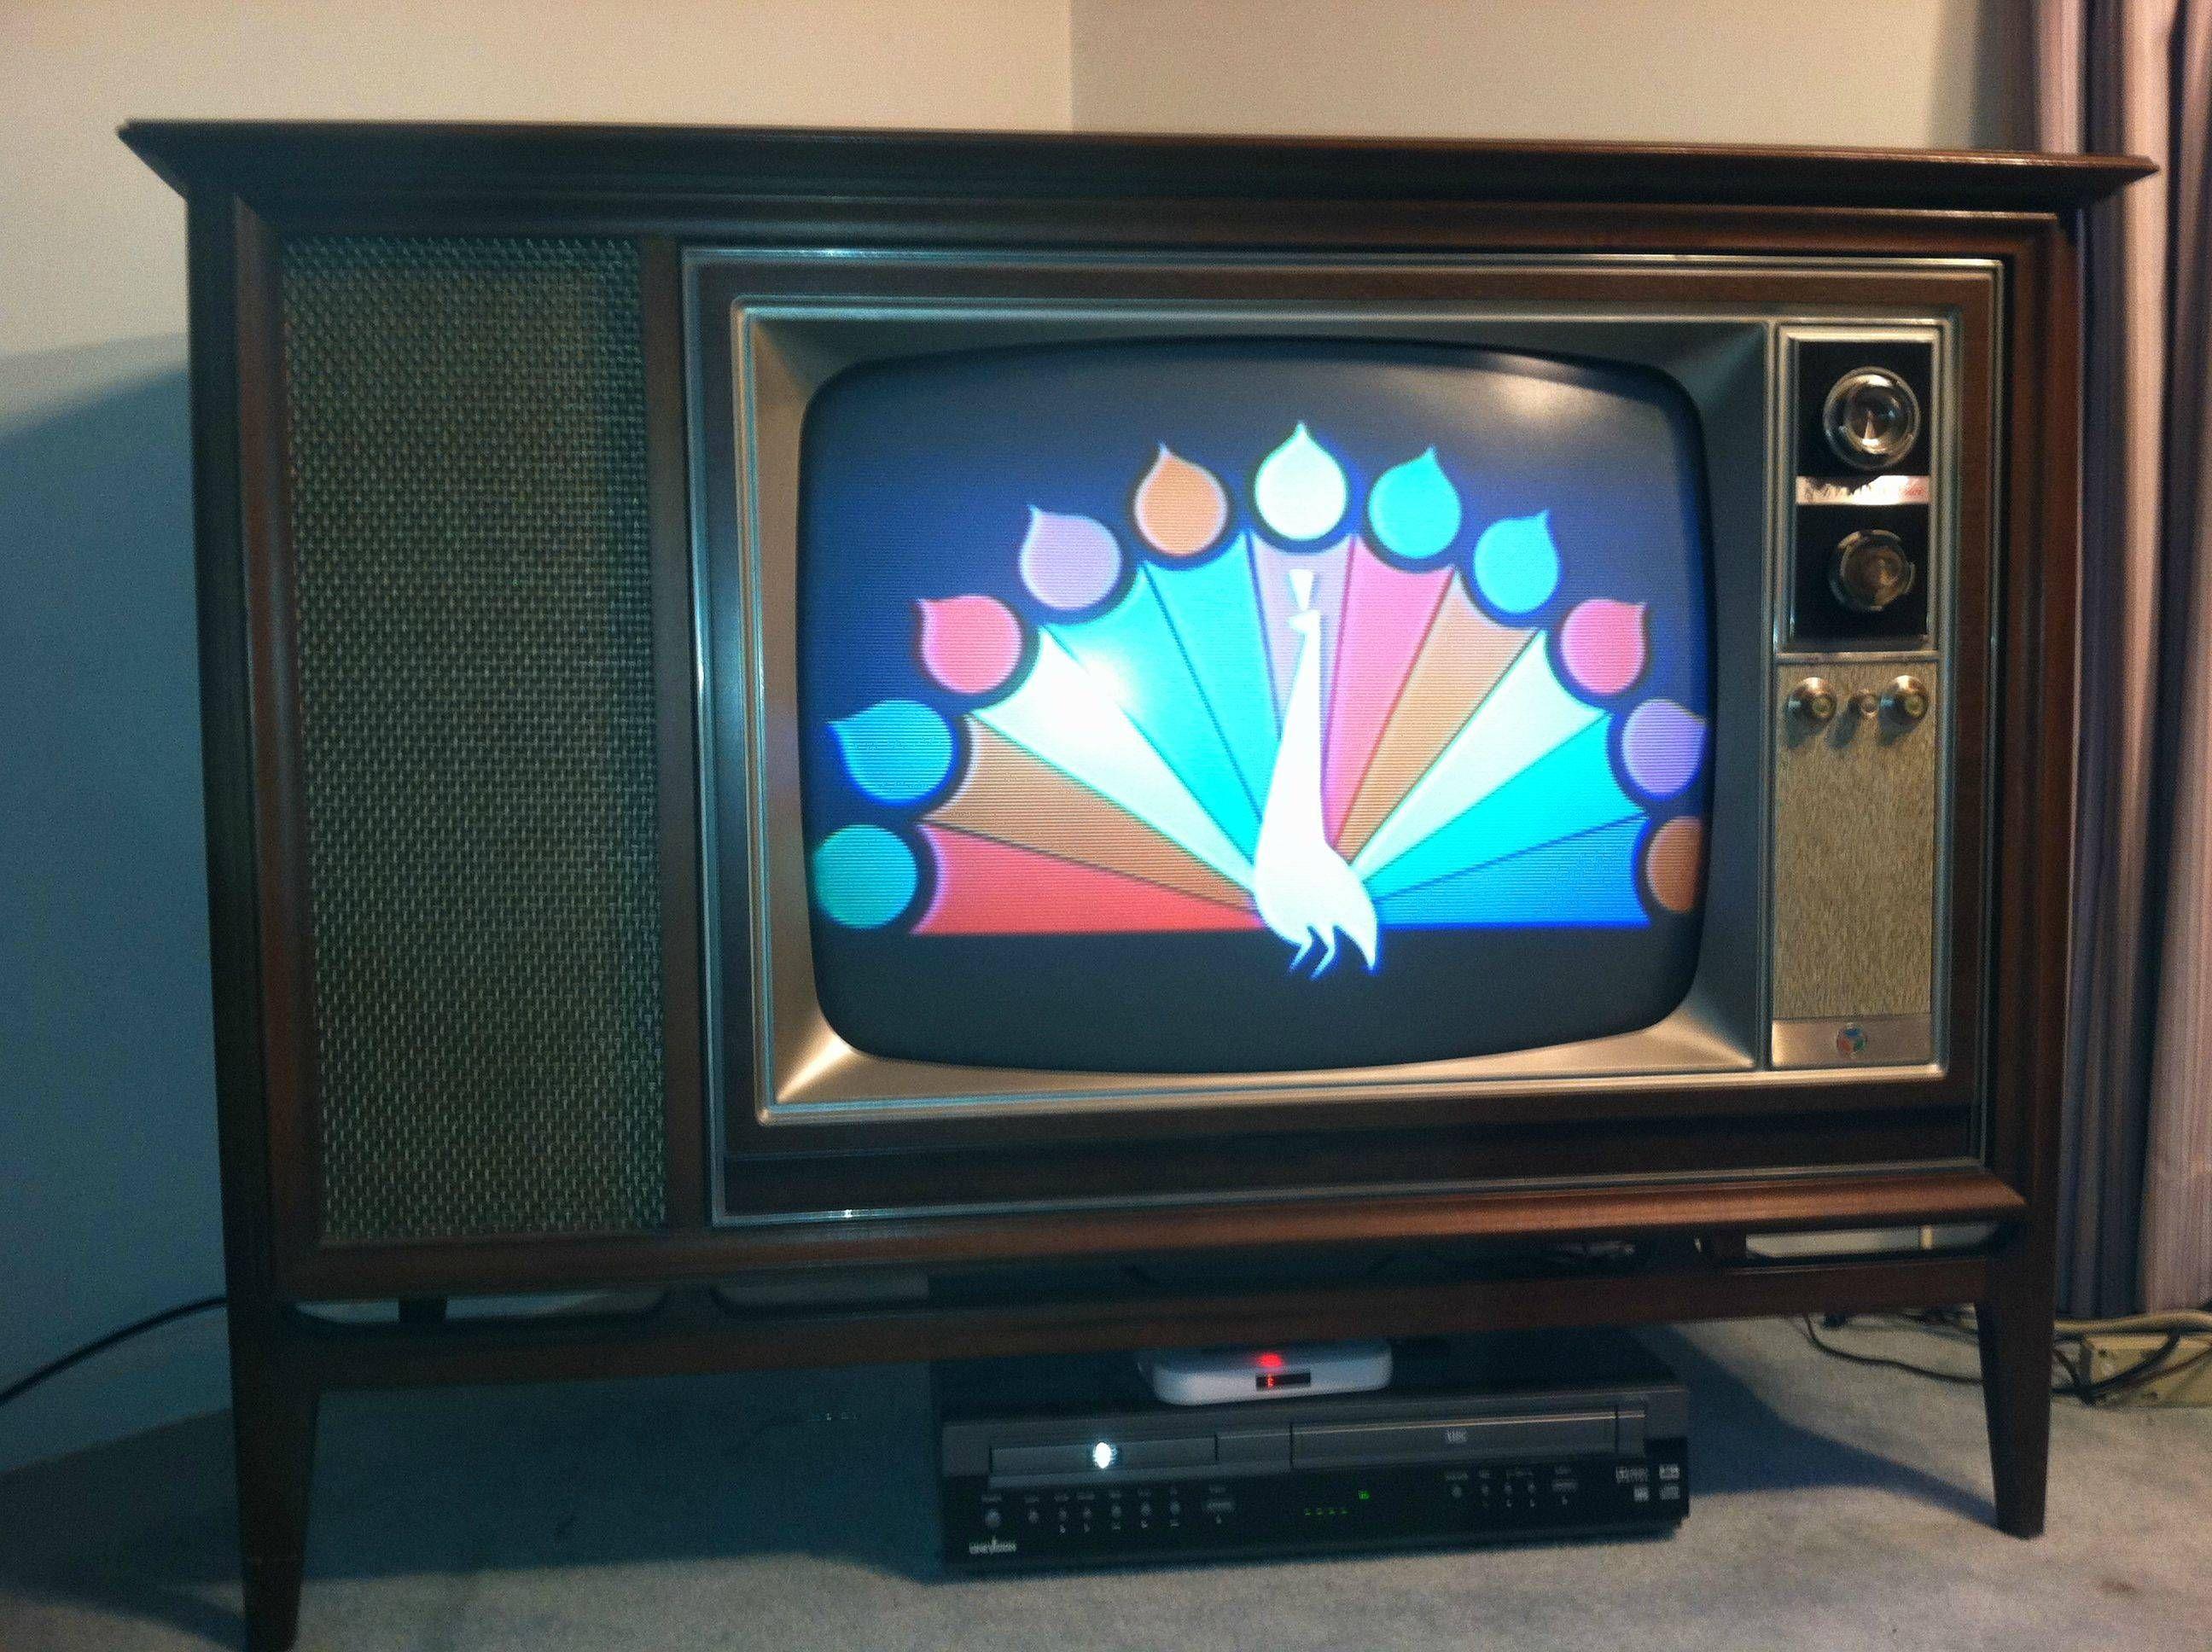 1966 Zenith 25 Inch Color Tv With A Danish Modern Cabinet Vintage Television Vintage Tv Old Tv